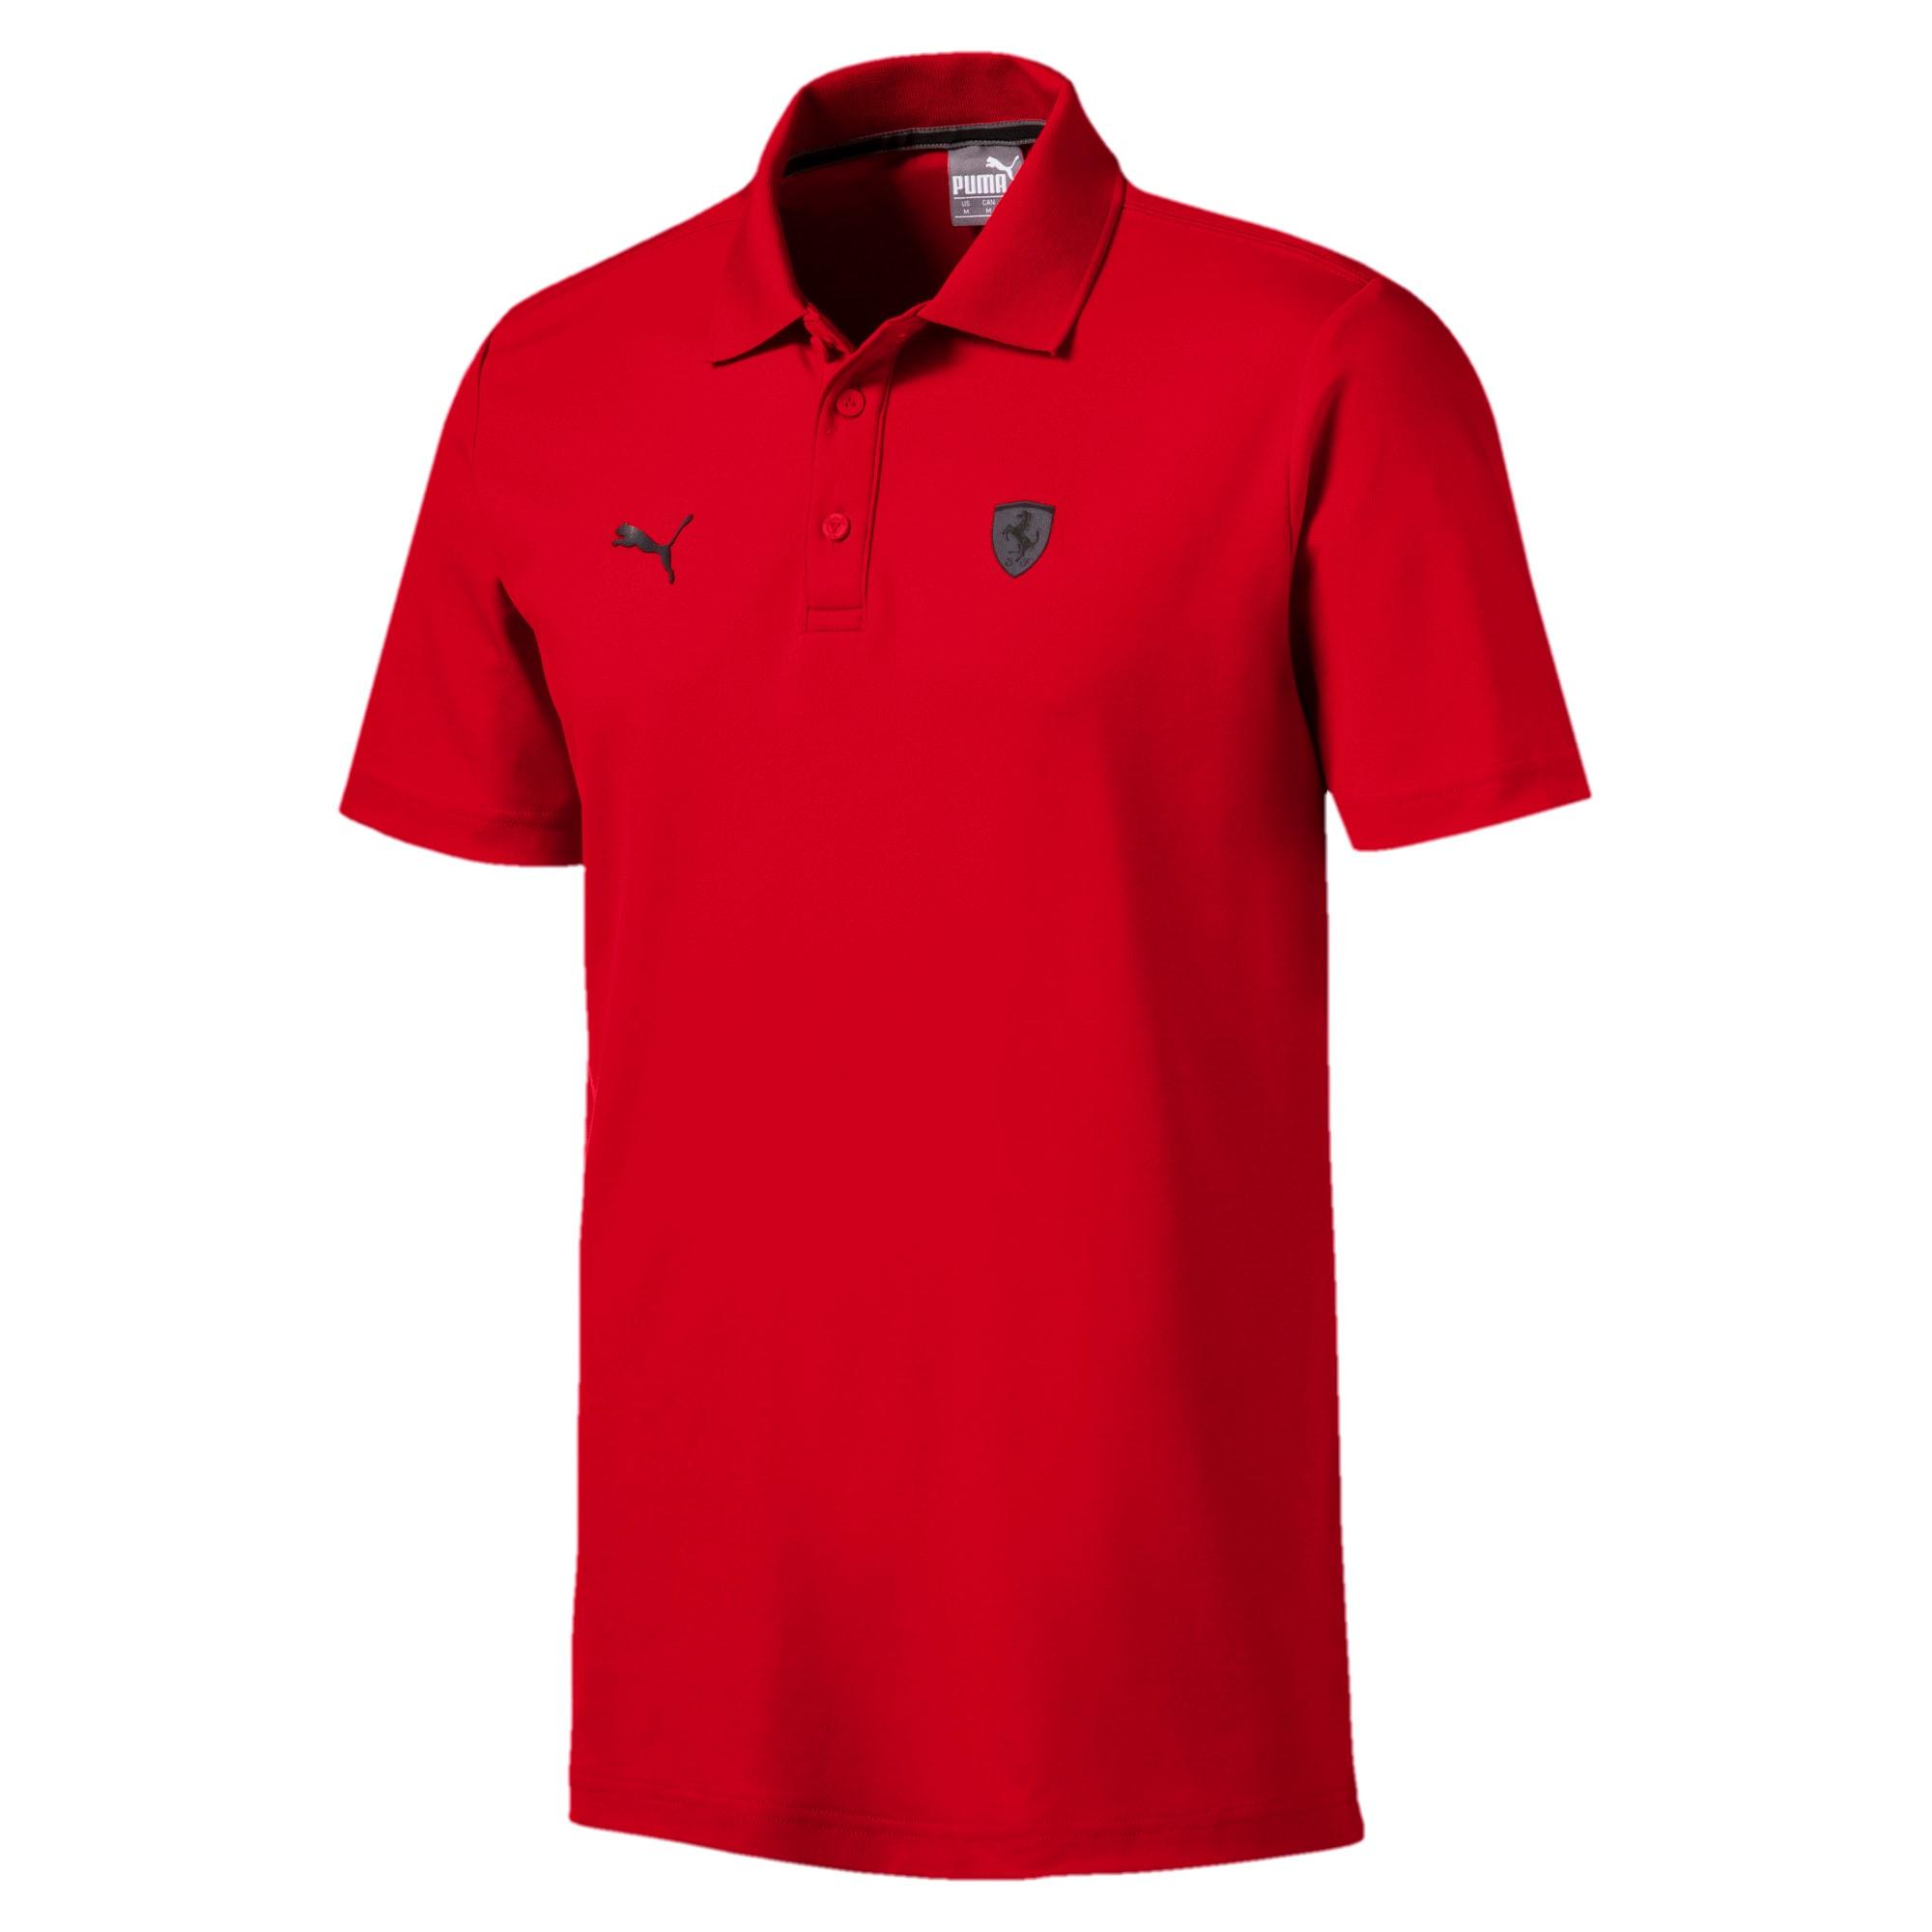 Thumbnail 5 of Ferrari Men's Polo Shirt, Rosso Corsa, medium